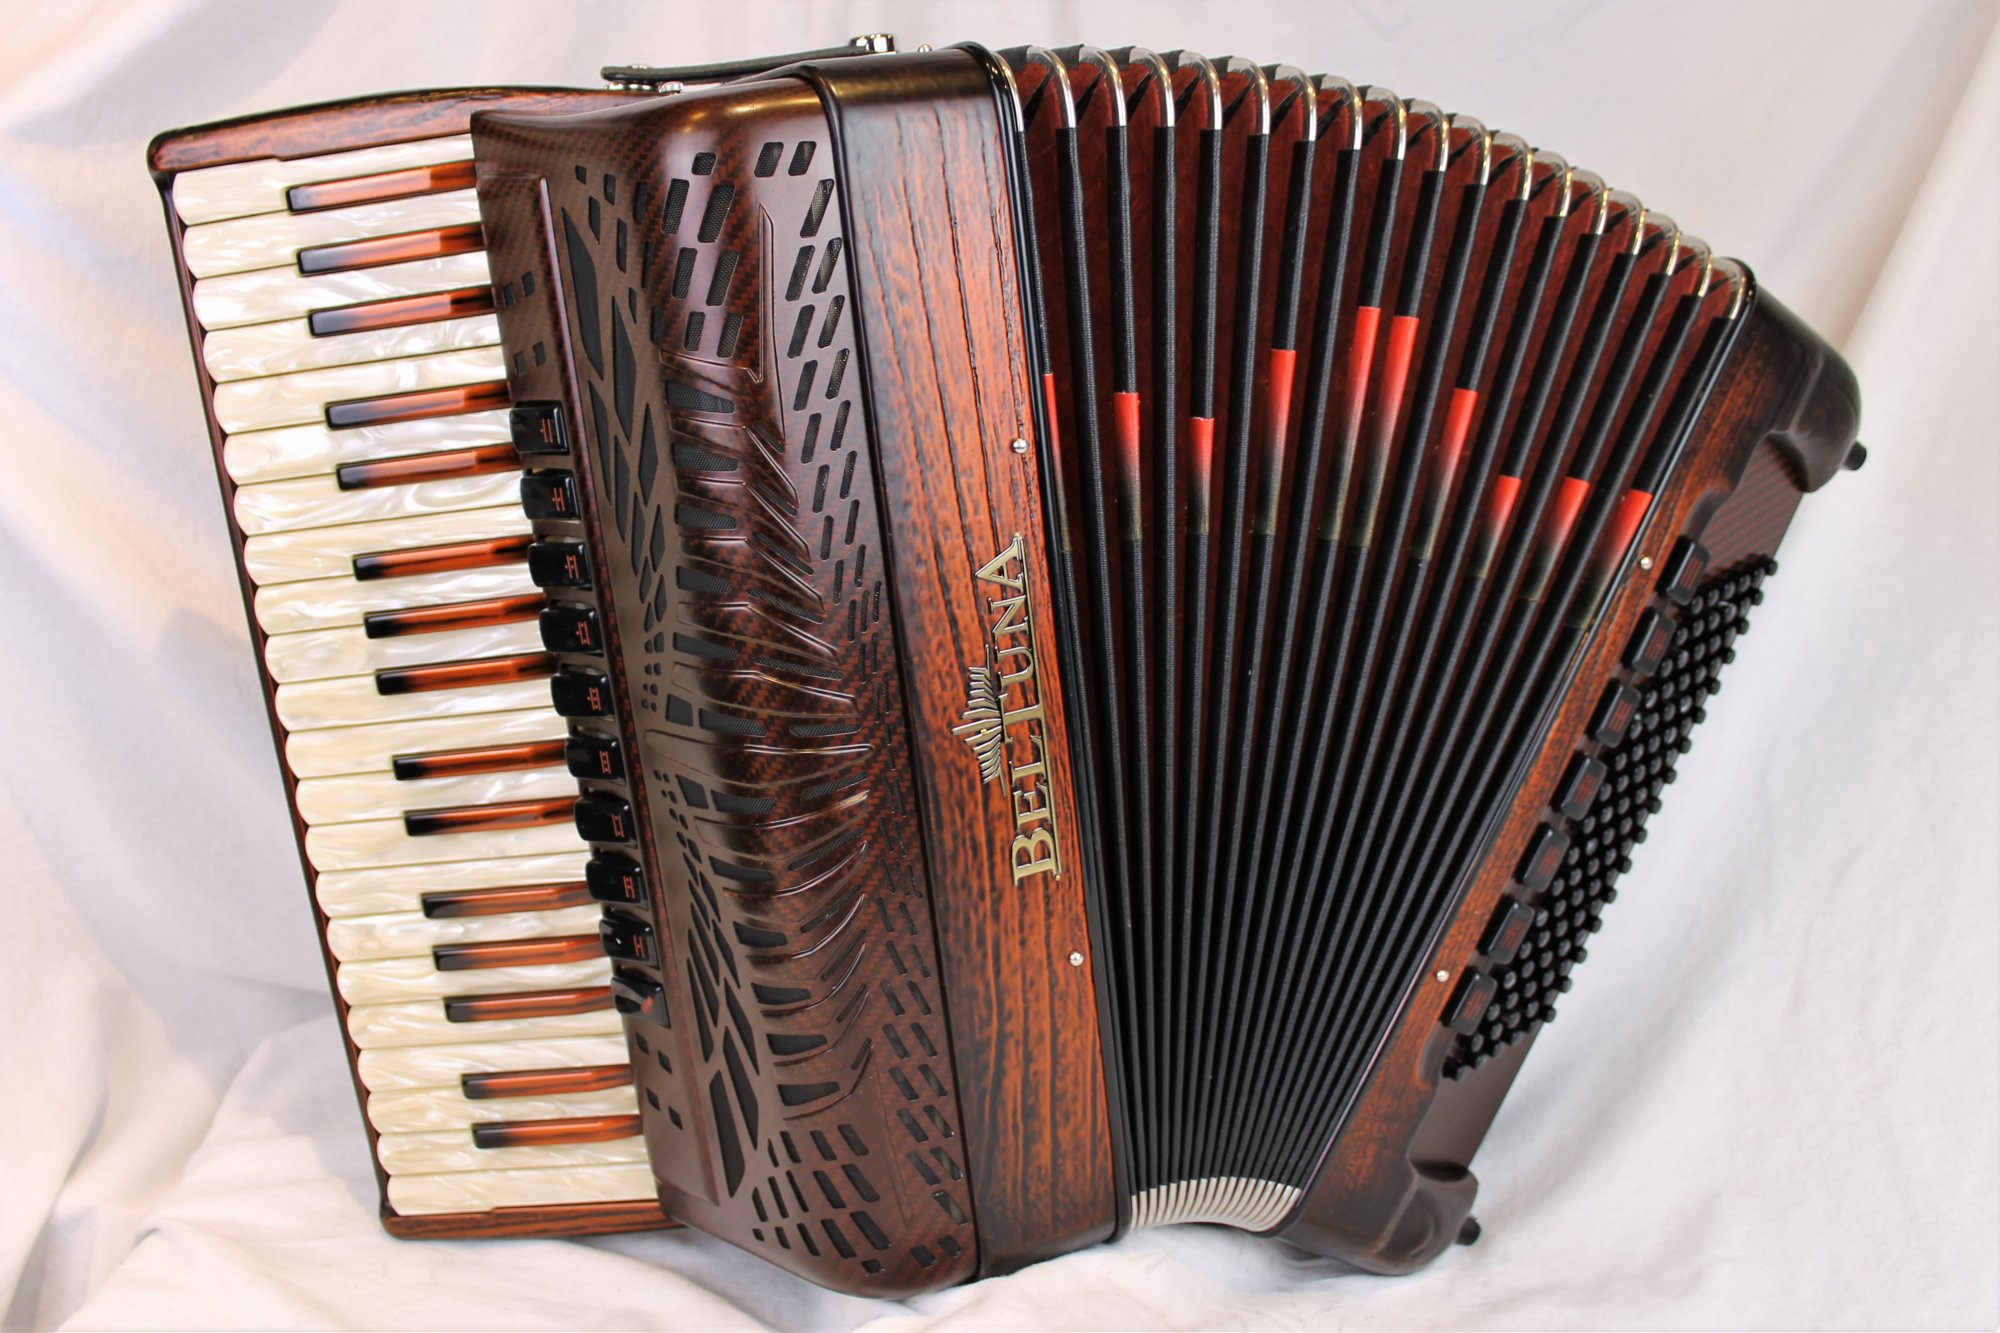 NEW Carved Copper Beltuna Prestige IV Fly Special Piano Accordion LMMM 37 96